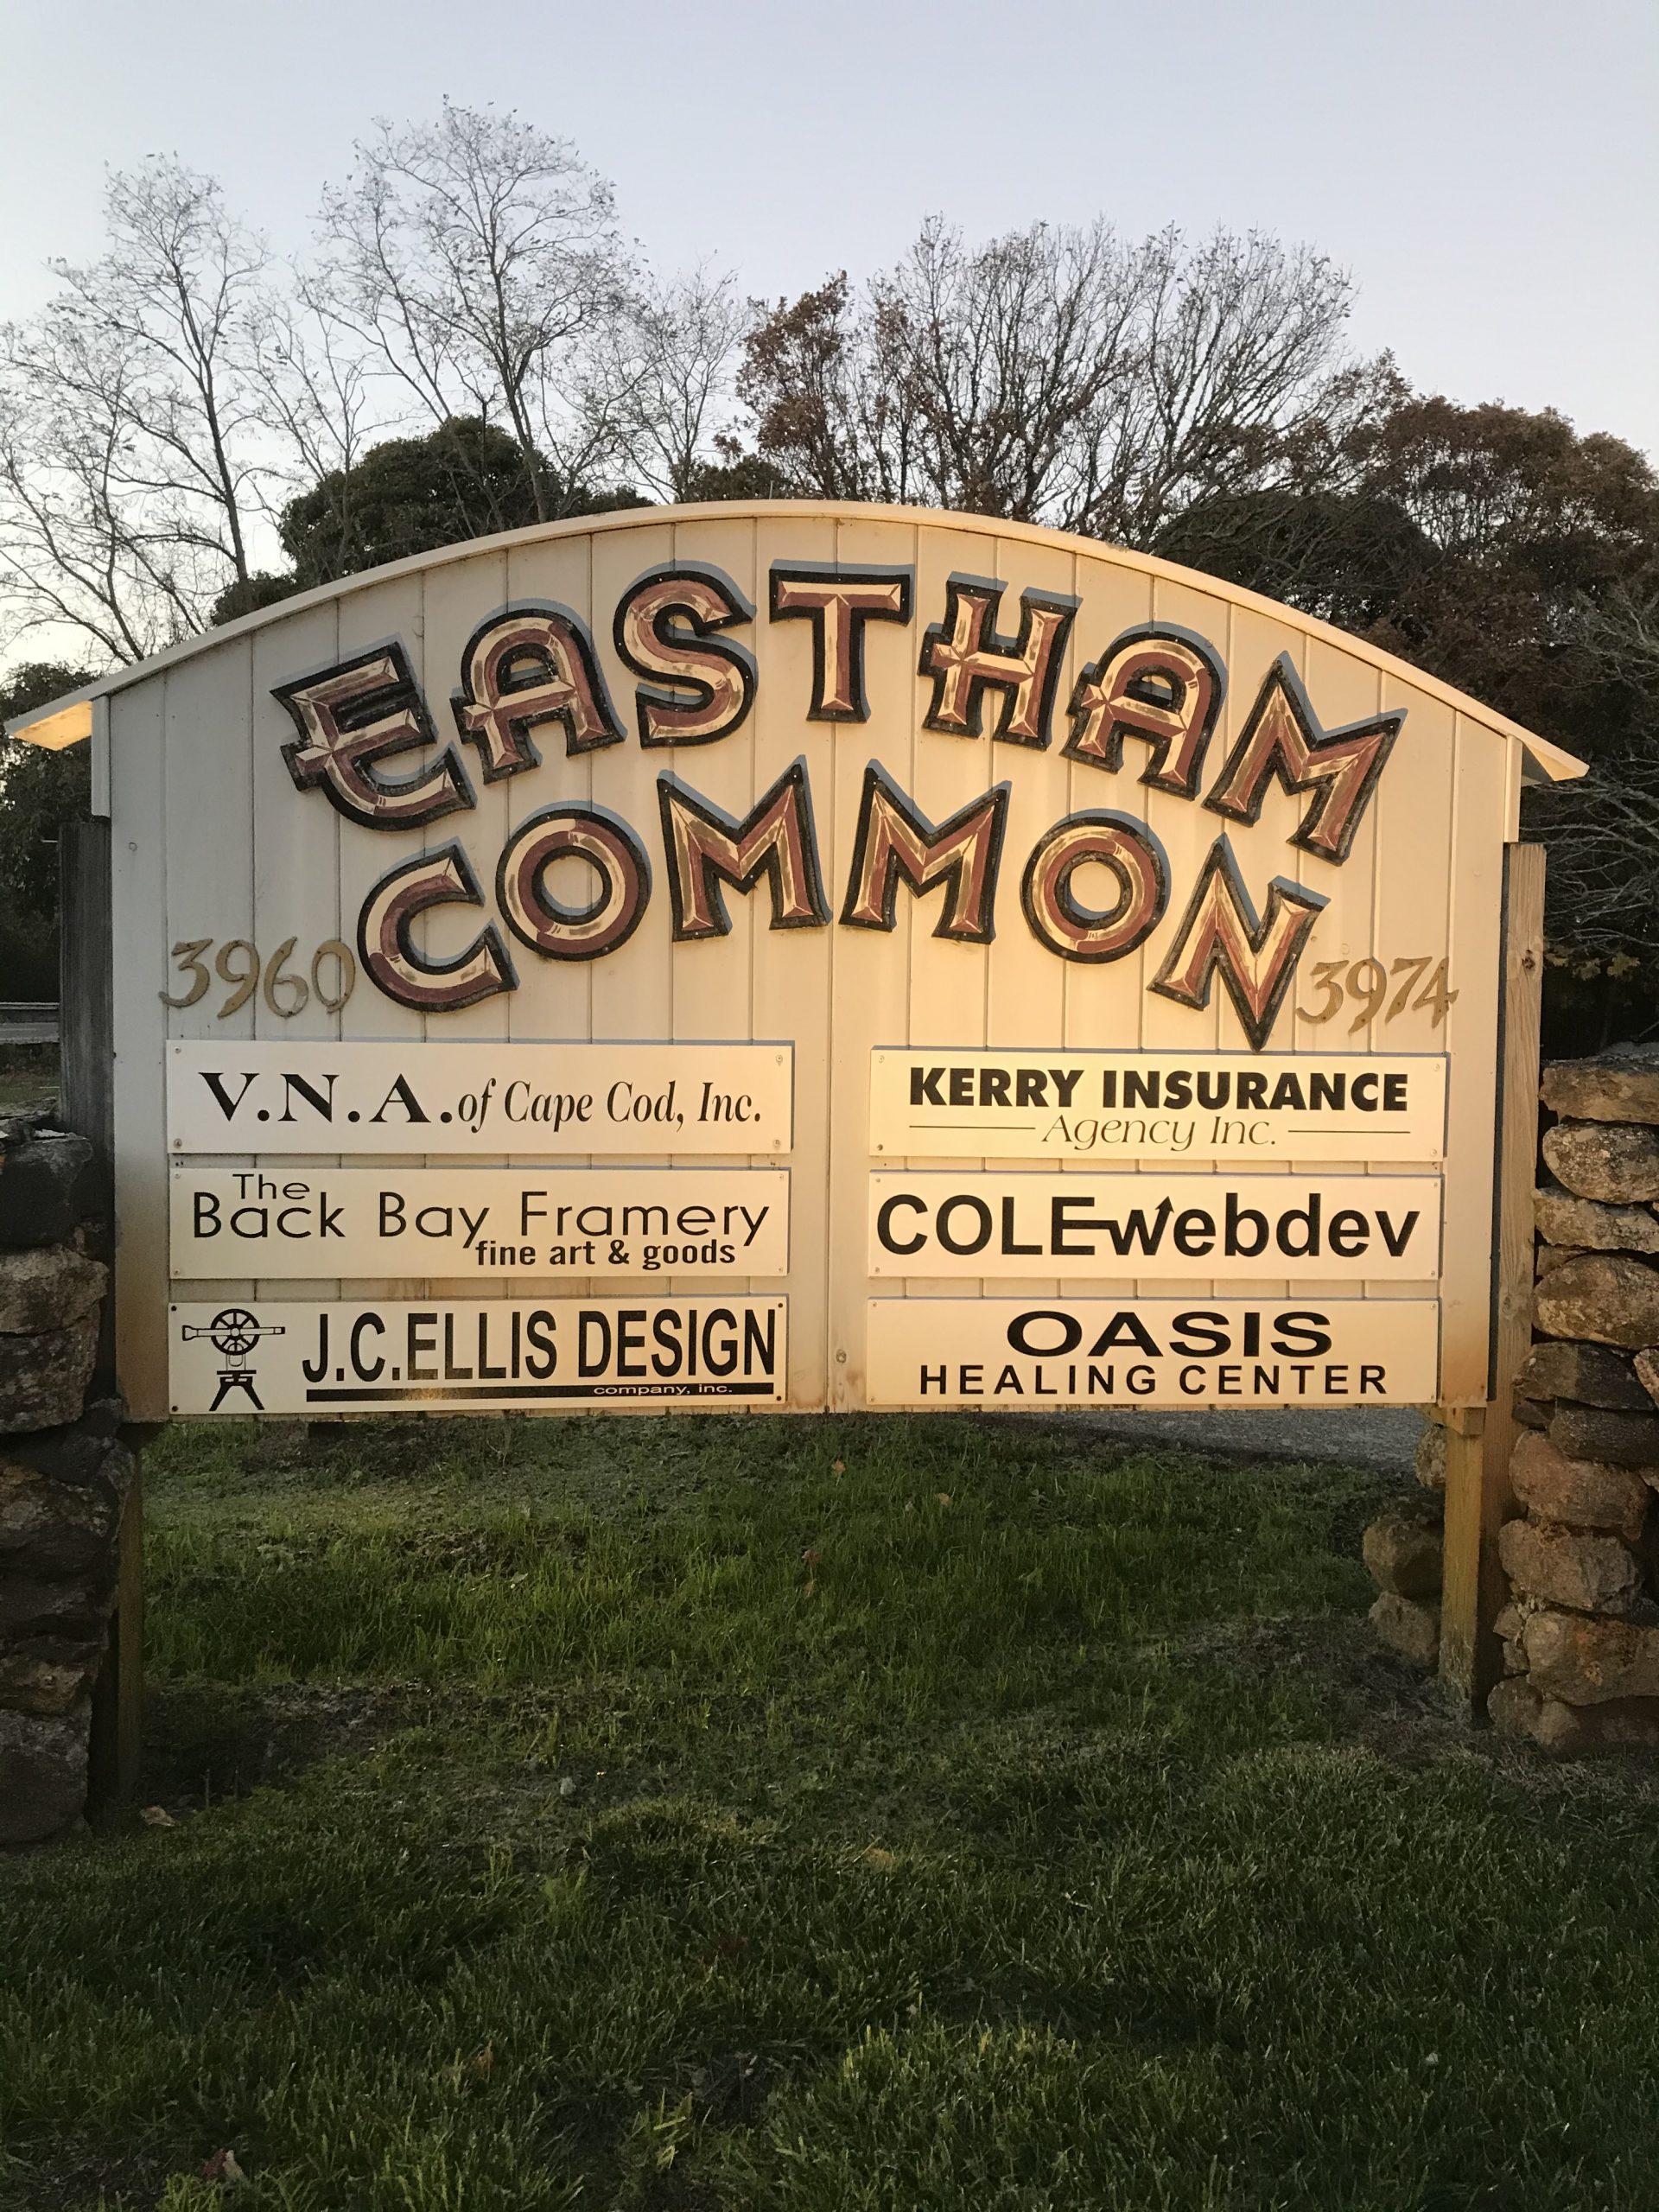 Eastham Common